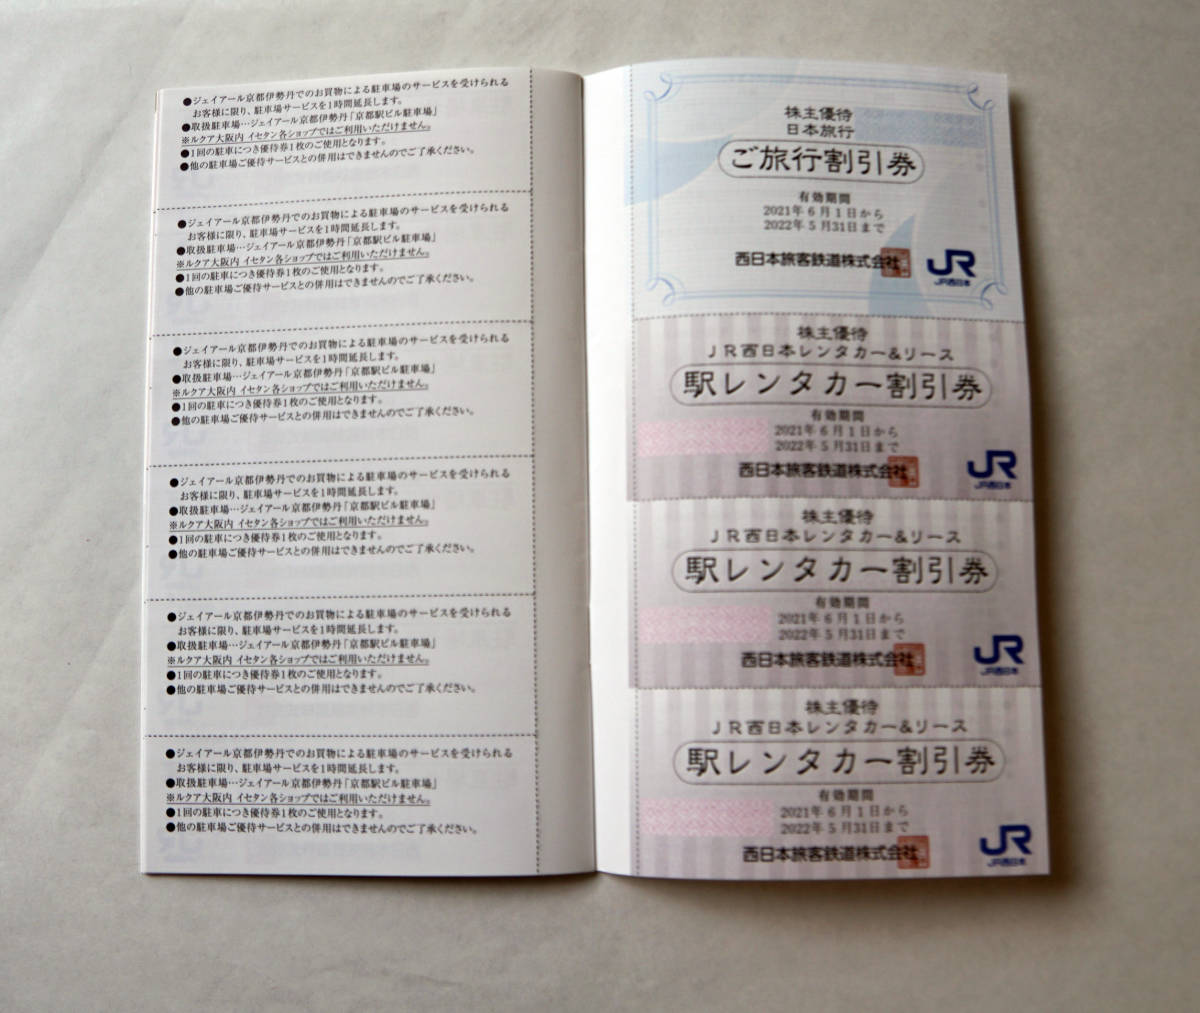 JR西日本 株主優待鉄道割引券 X10枚+三越百貨店、ホテル・レストランなど割引券 有効期限 2022年5月31日まで_画像10